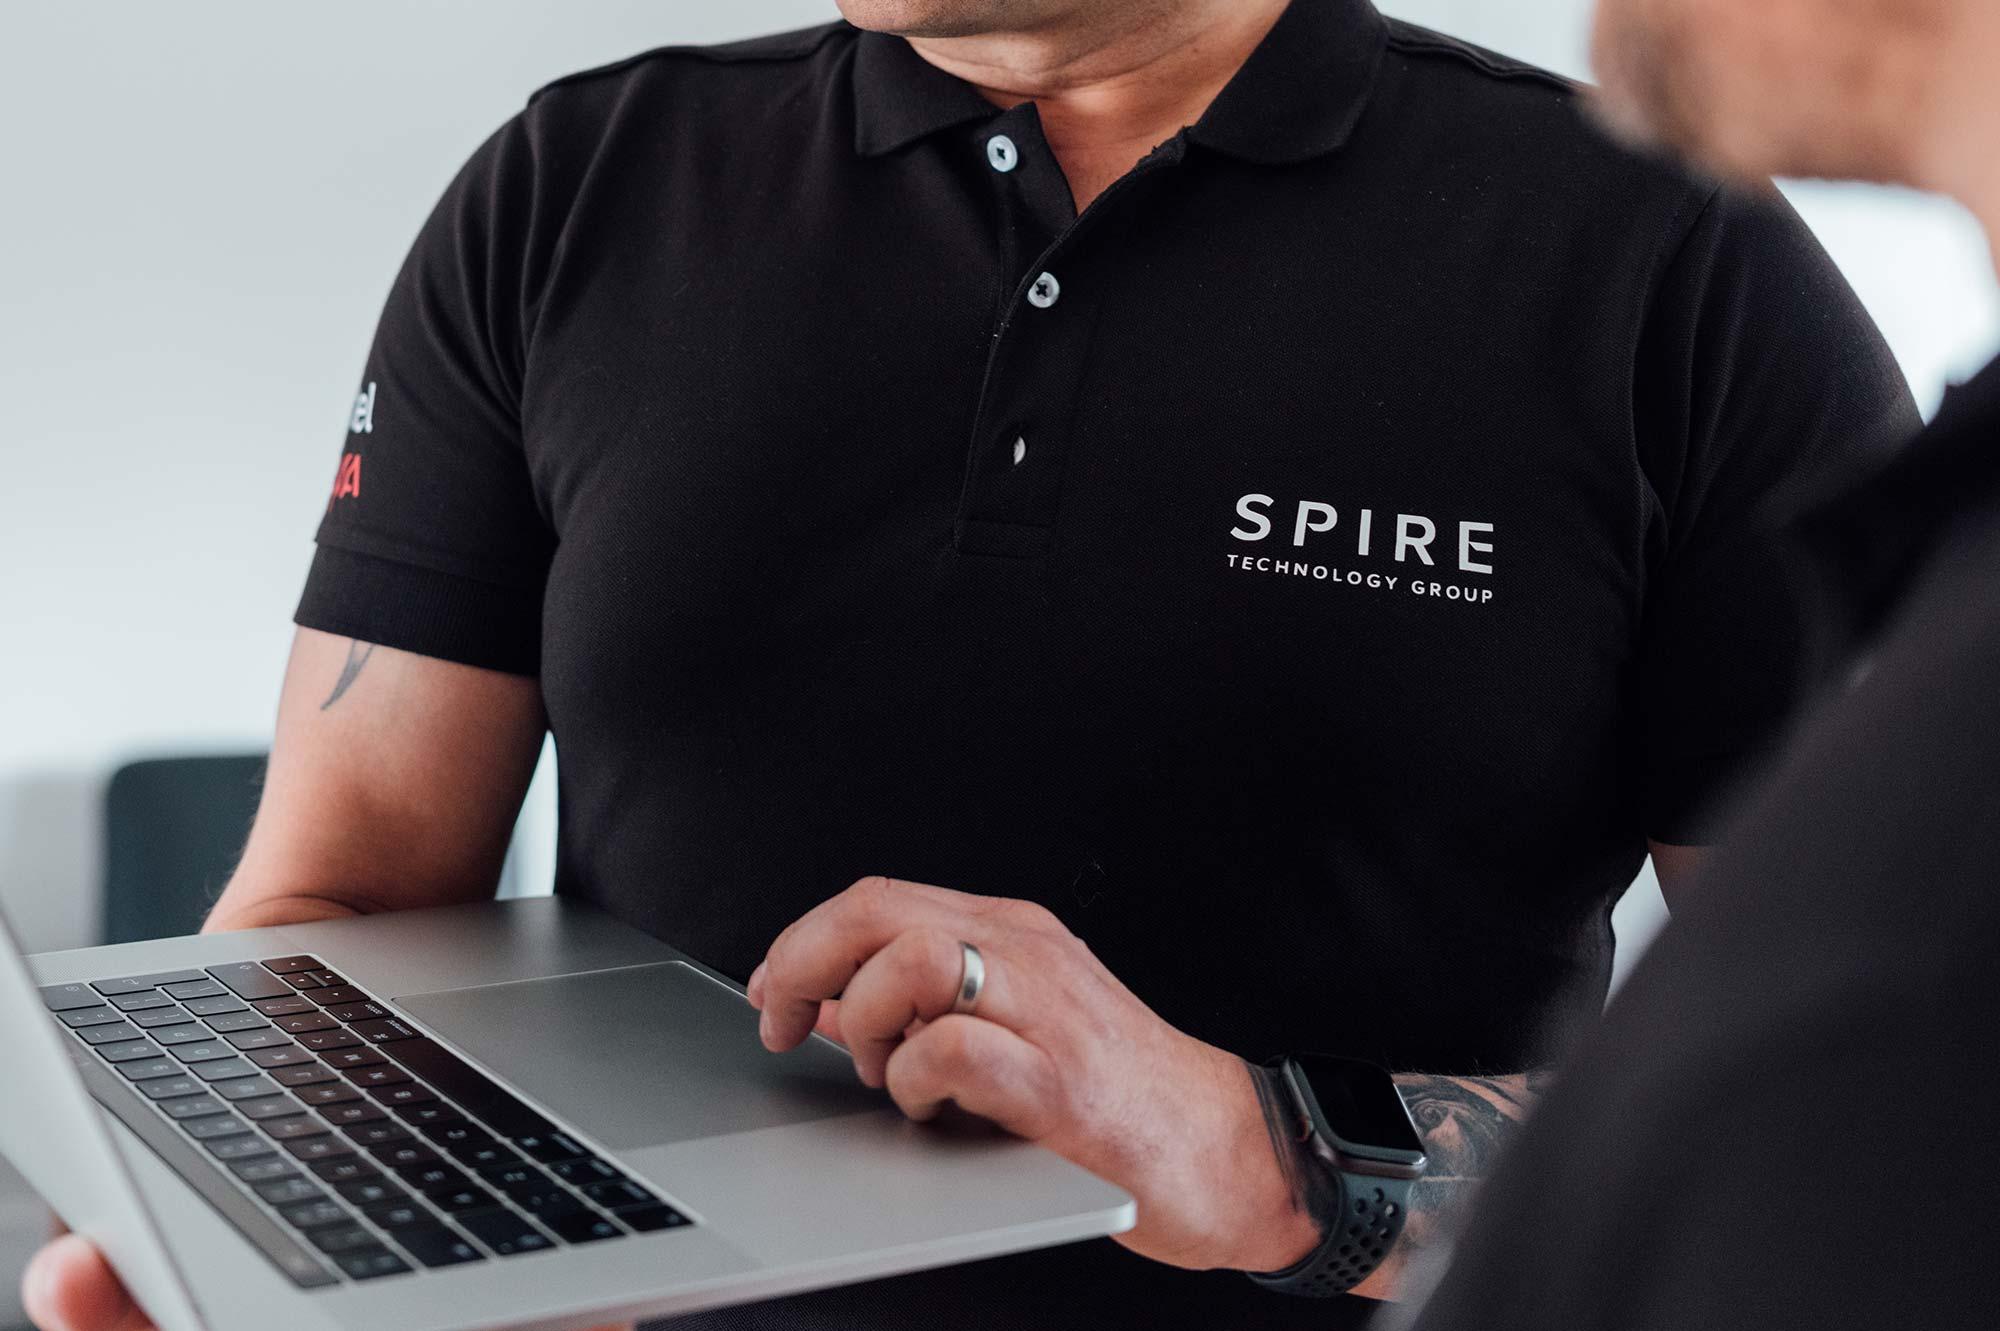 IT professional holding laptop